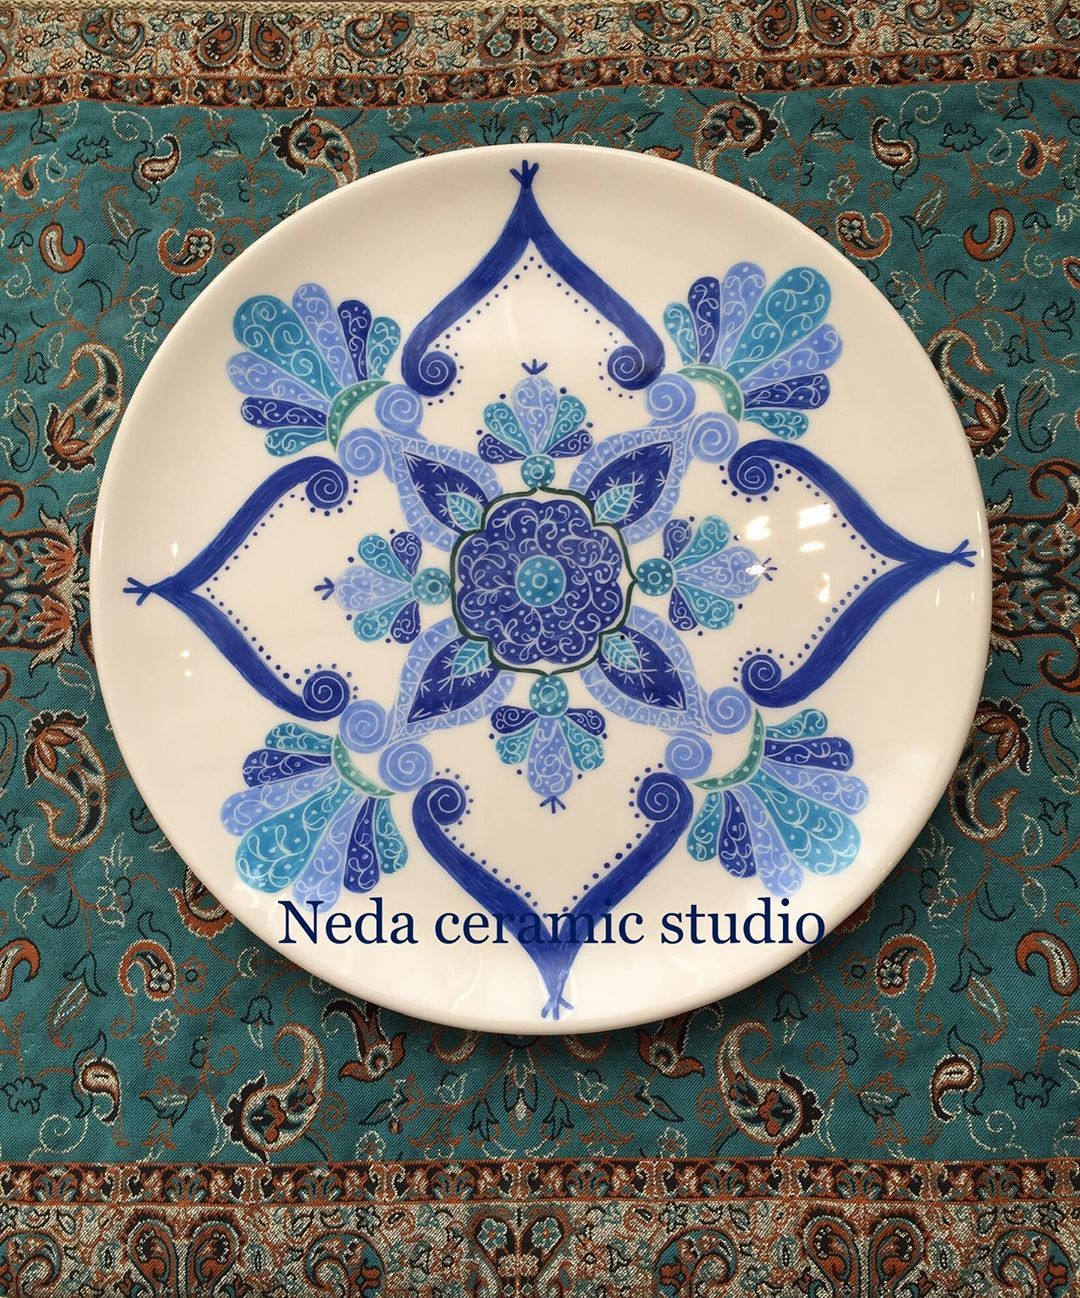 Pin On Nedabayat Ceramic Studio